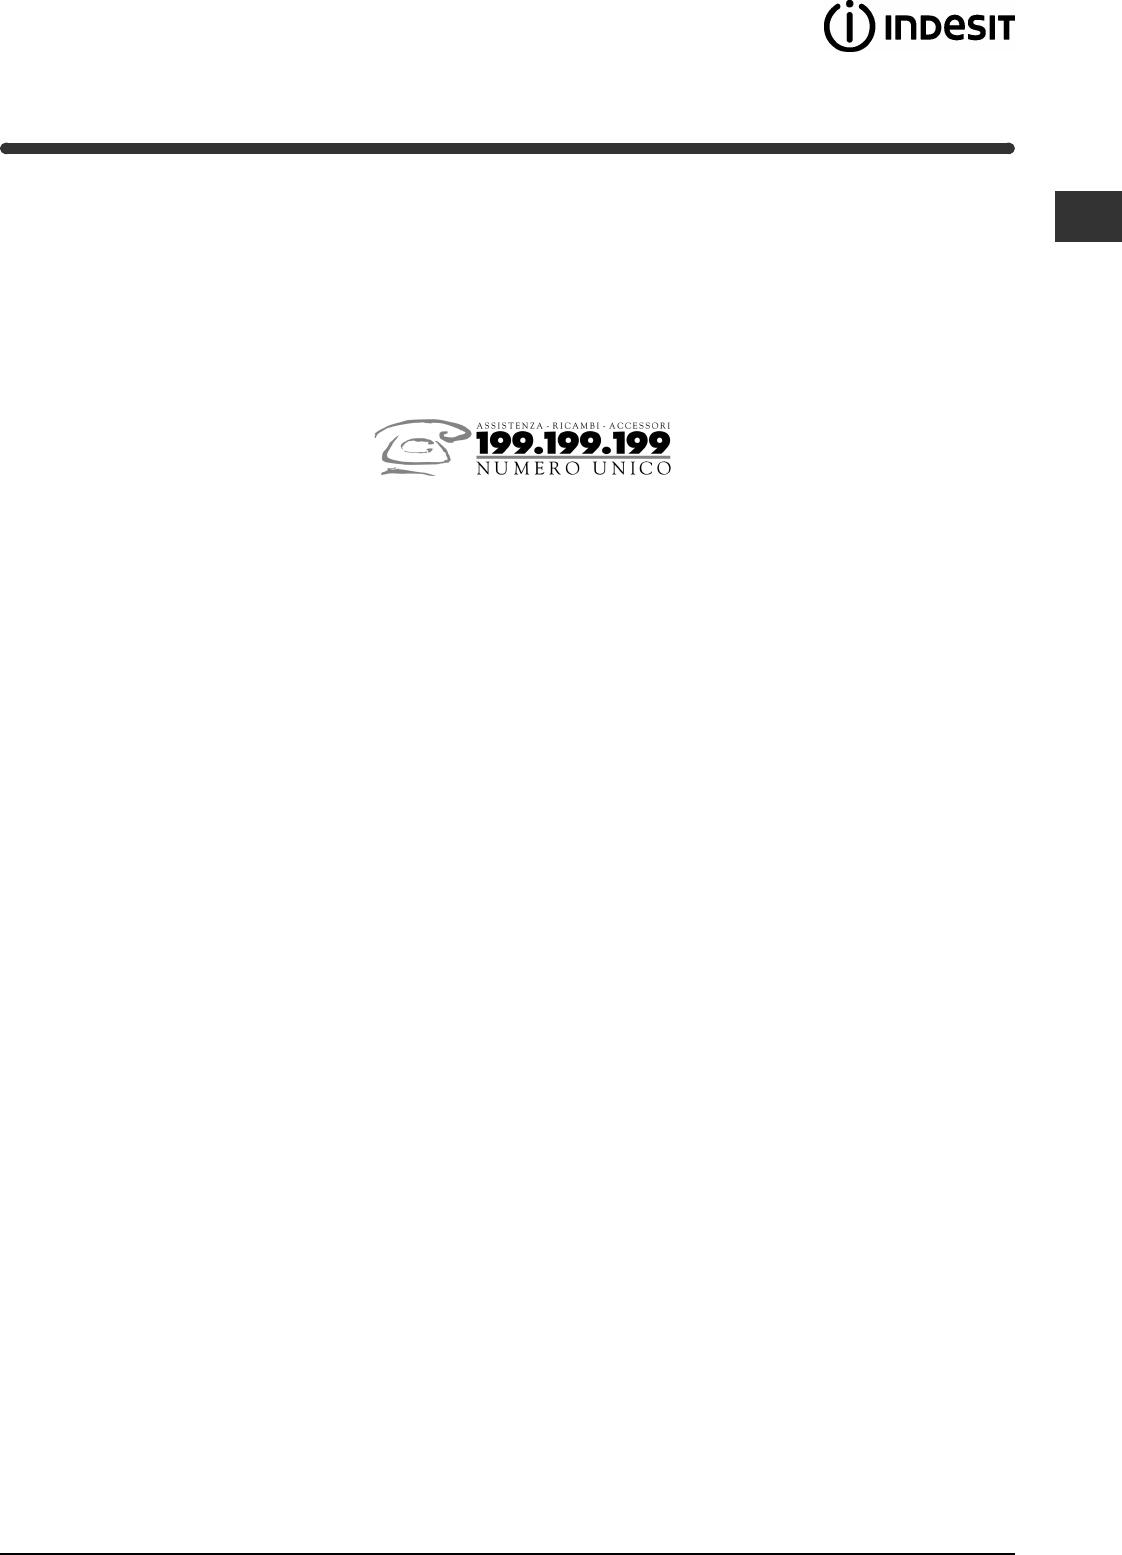 Handleiding Indesit FI 51.B IX (pagina 11 van 72) (Deutsch, English ...